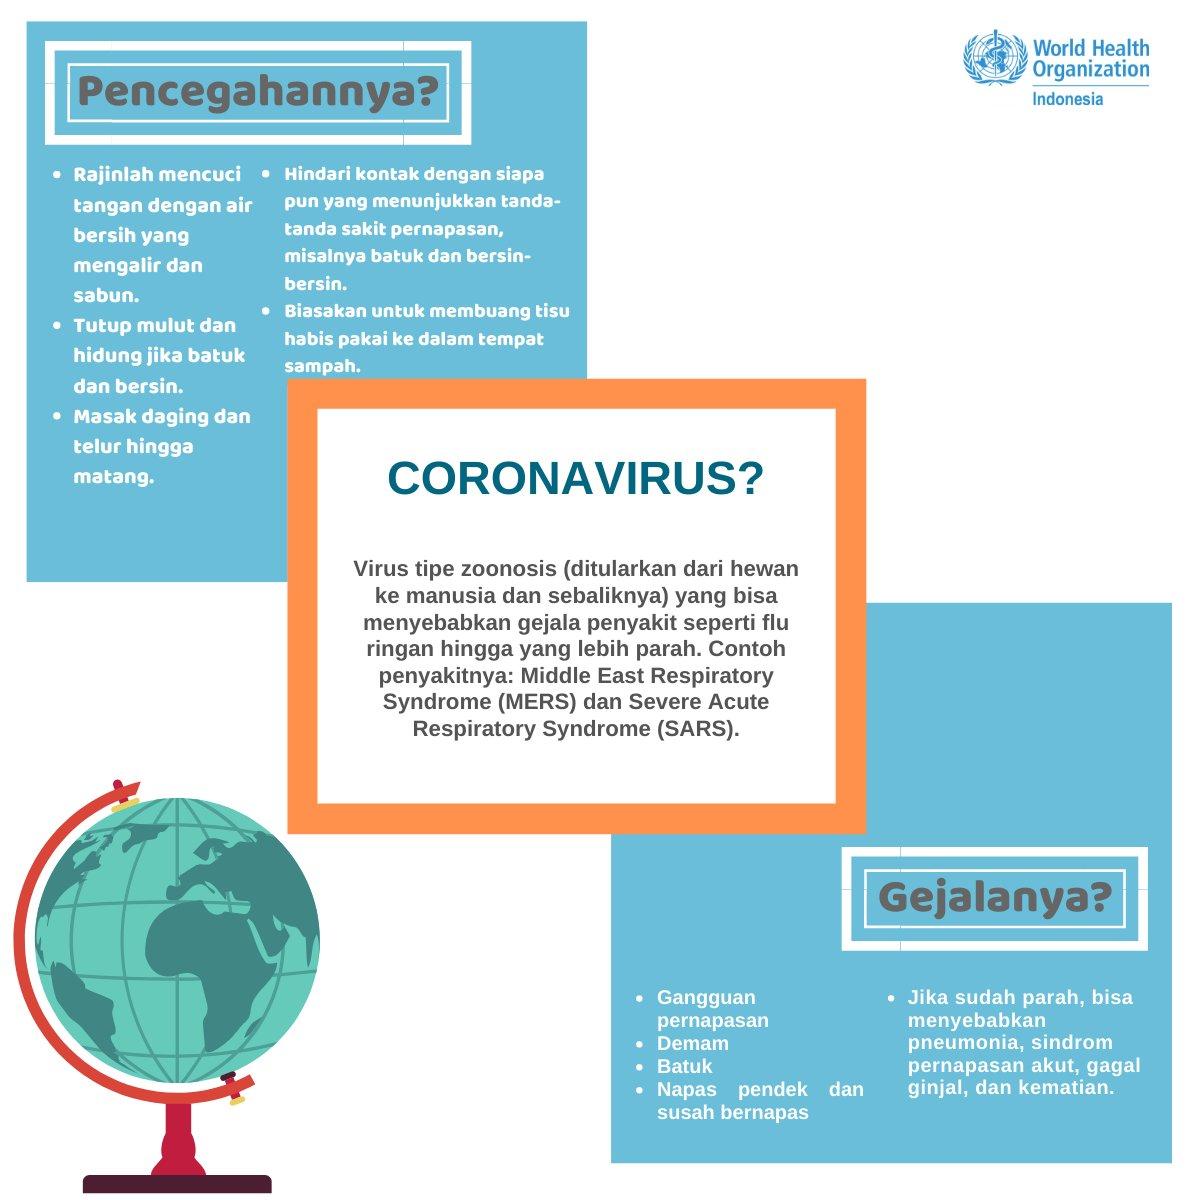 Pencegahan dan Gejala Virus Corona